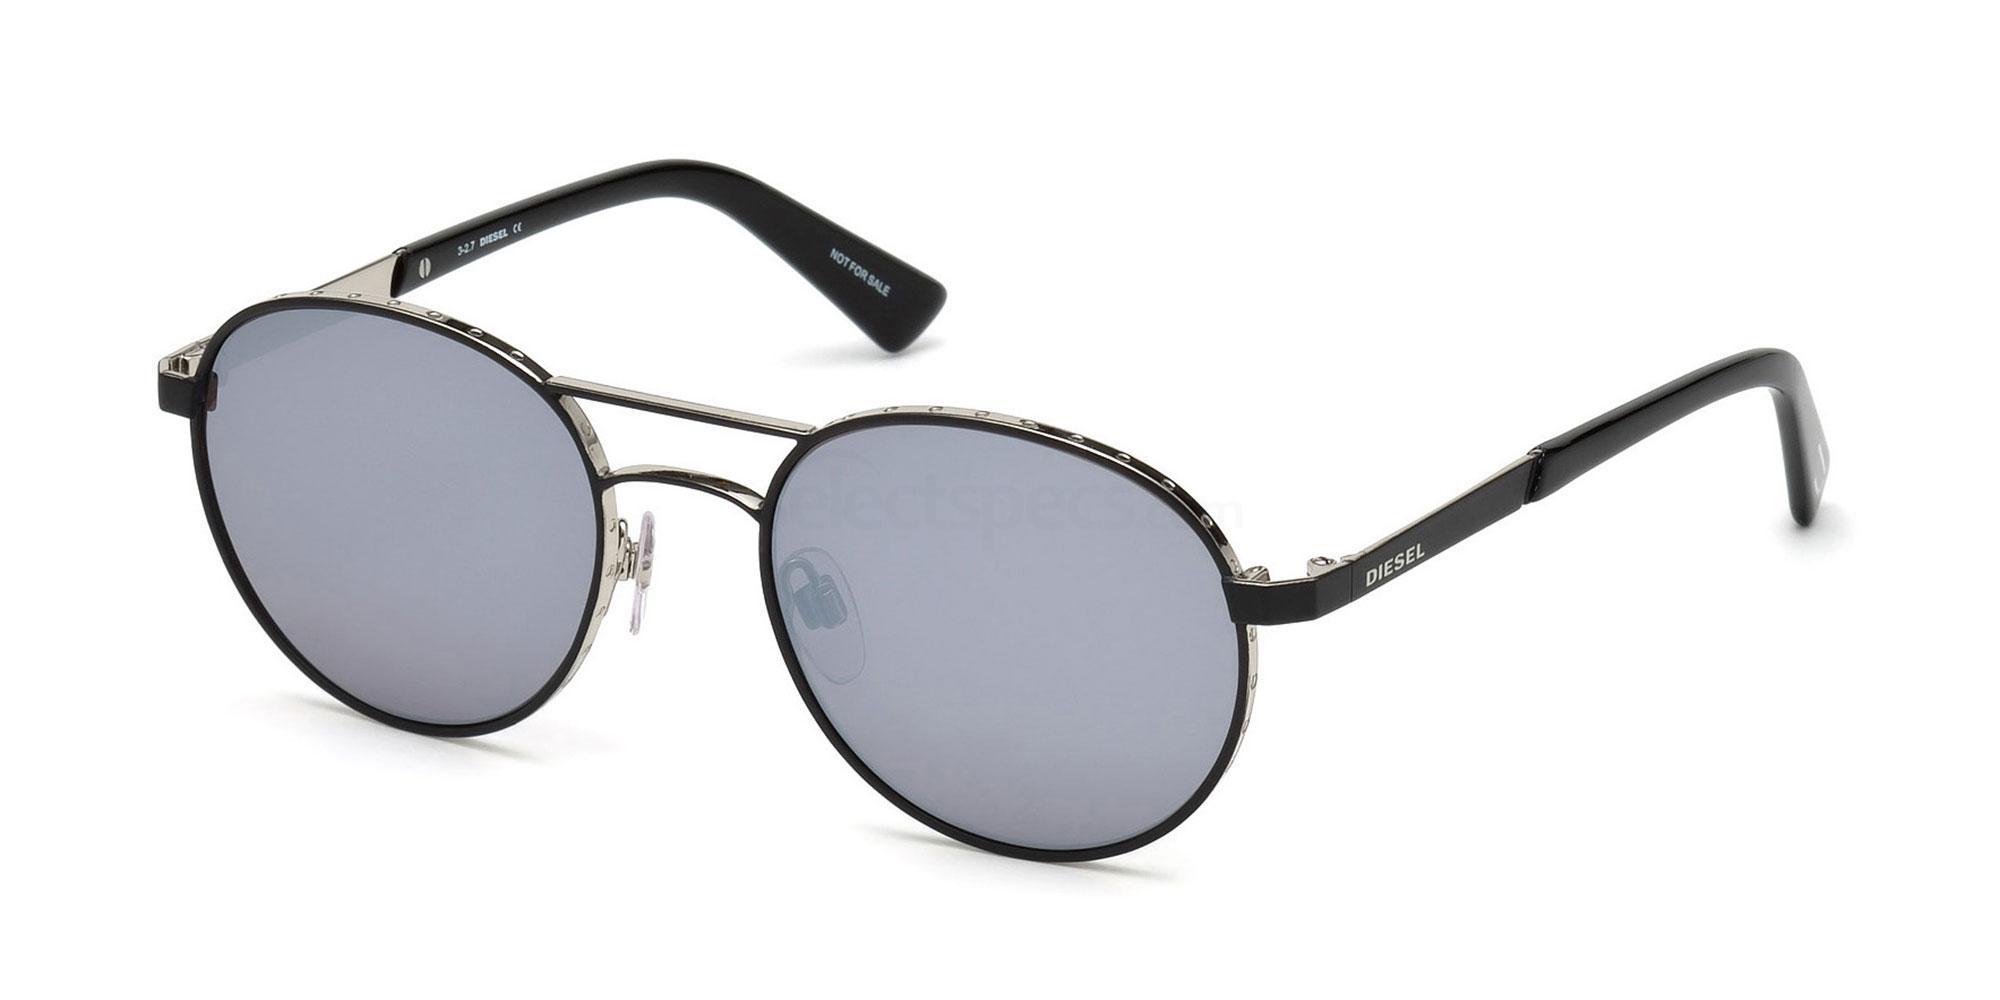 02C DL0265 Sunglasses, Diesel